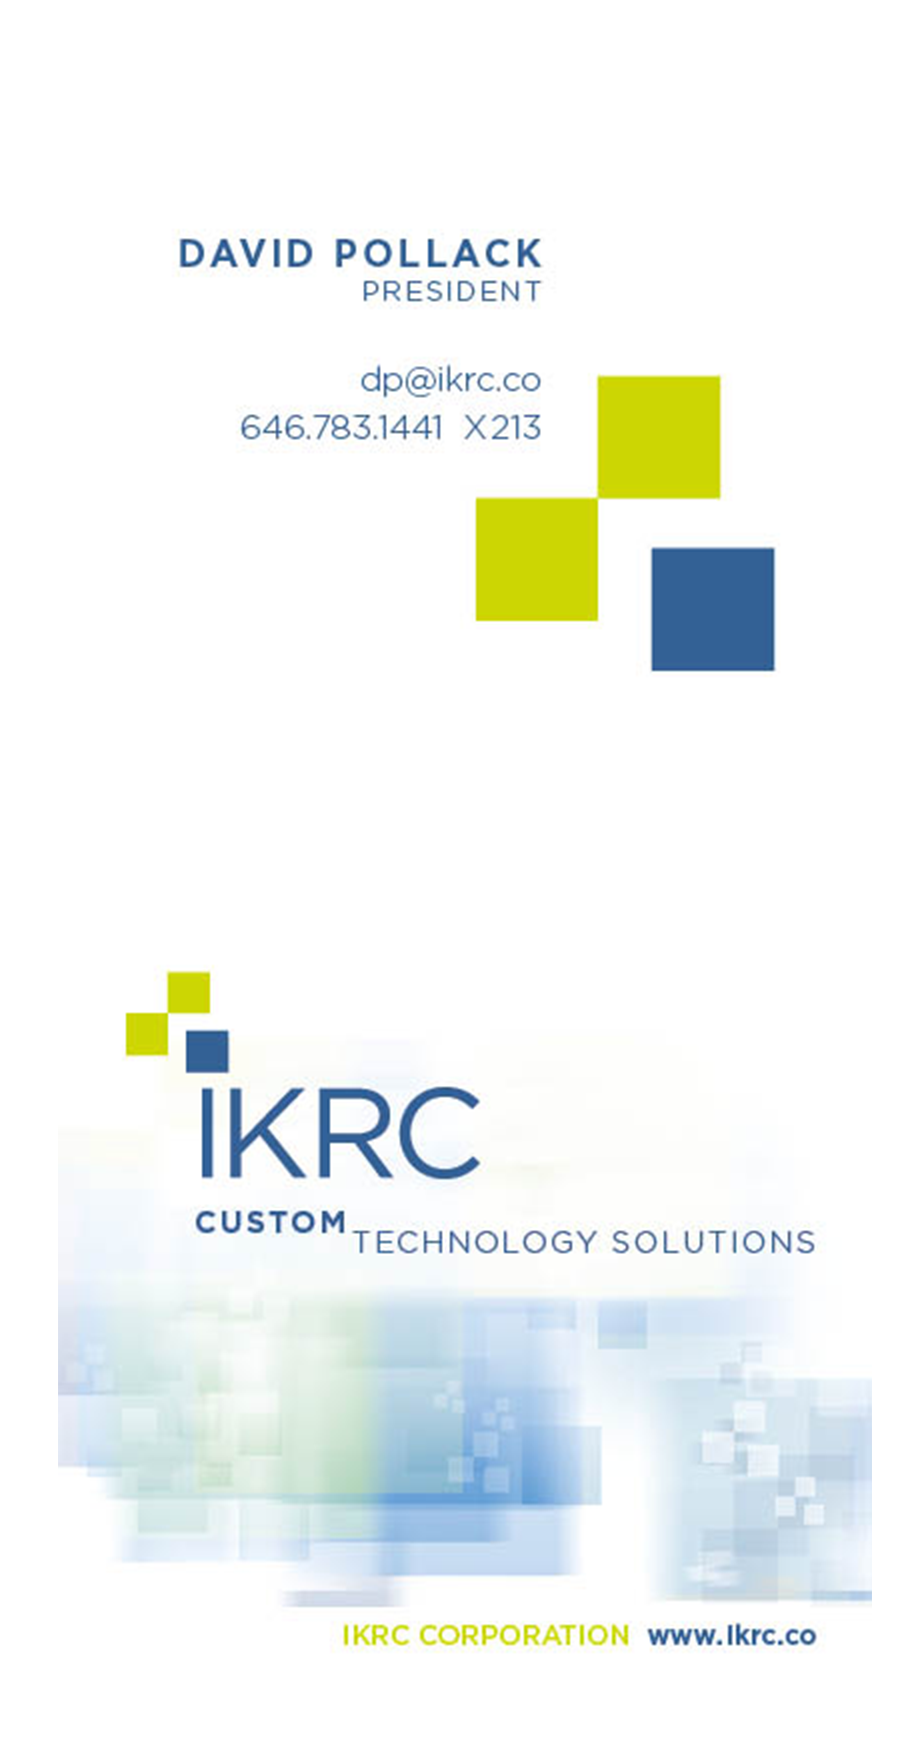 ikrc biz card.png